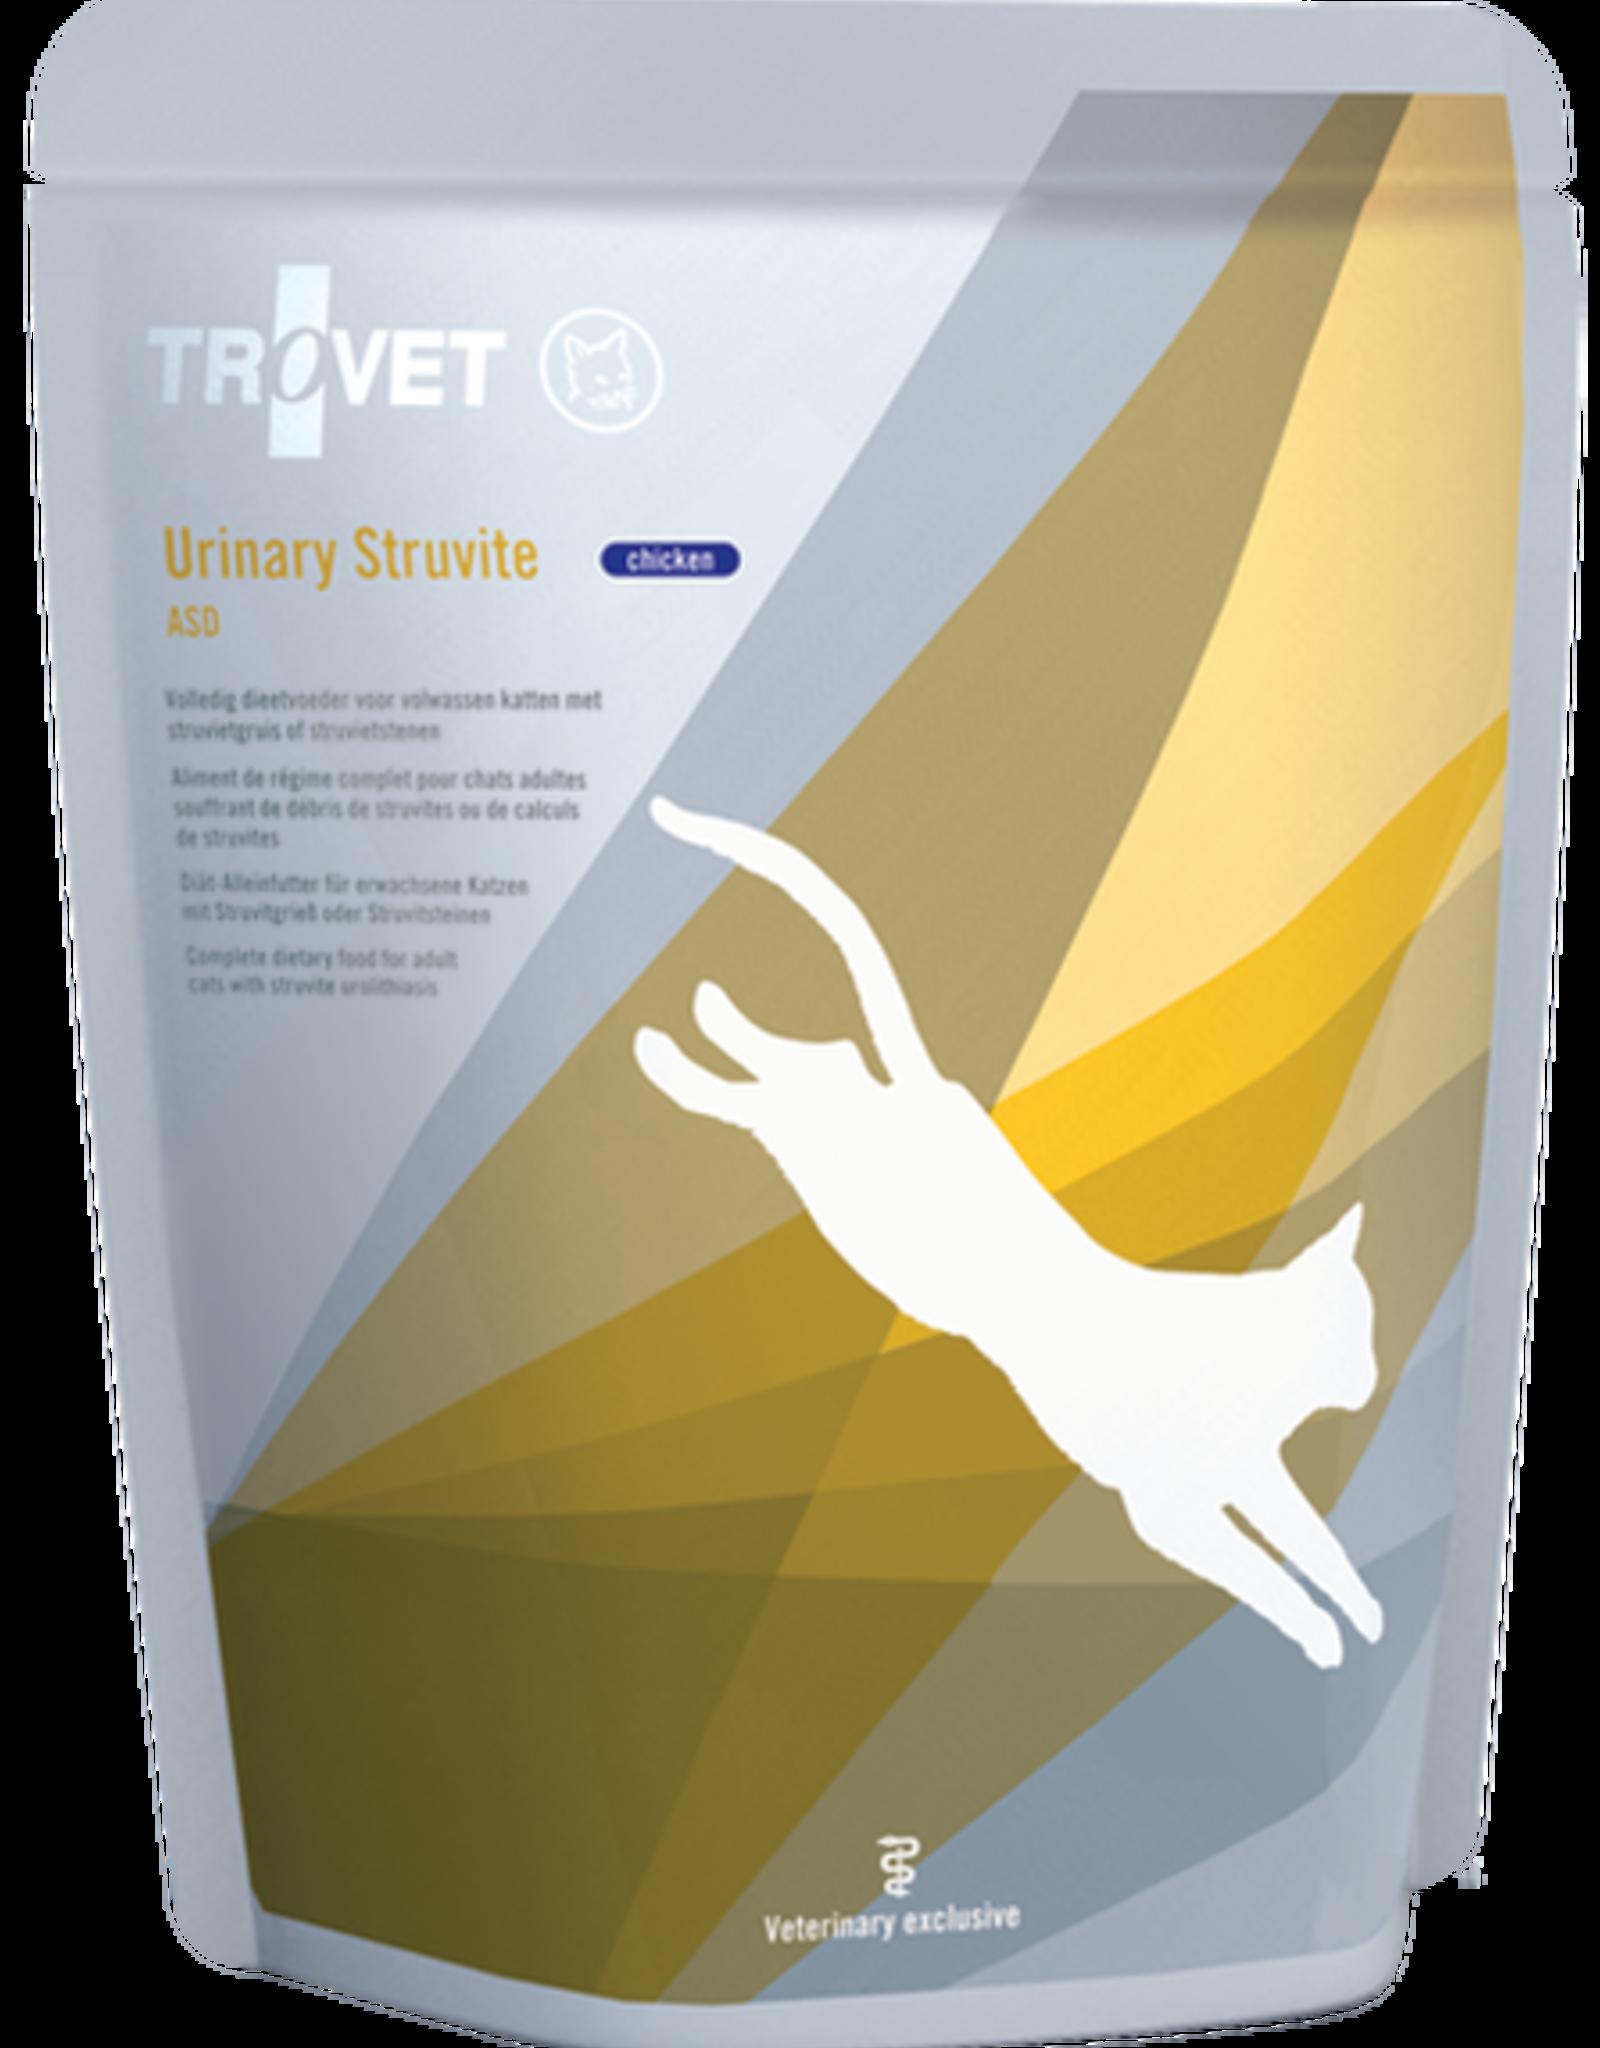 Trovet Feline Asd Urinary Struvite Chicken Pouch 24x85g